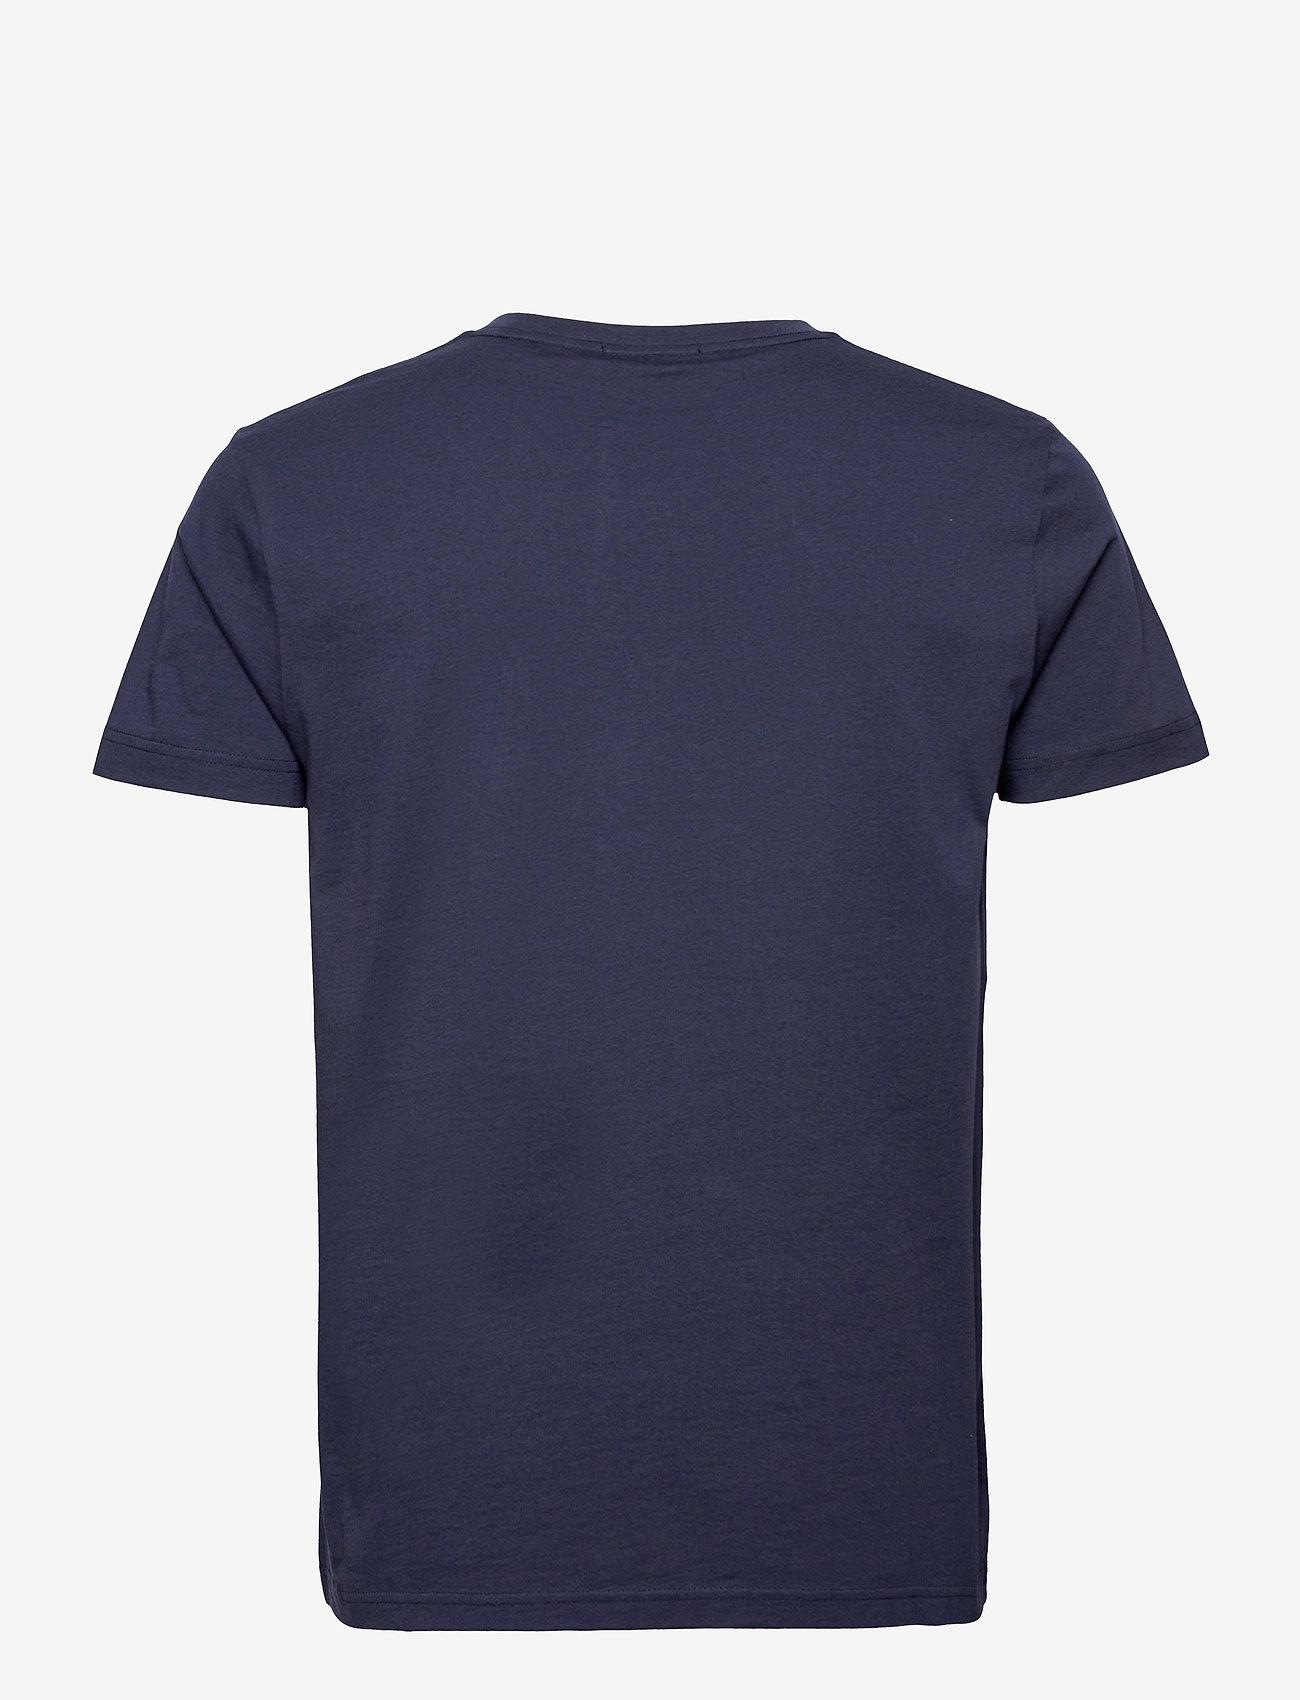 GANT - PRIDE. SS T-SHIRT - short-sleeved t-shirts - classic blue - 1